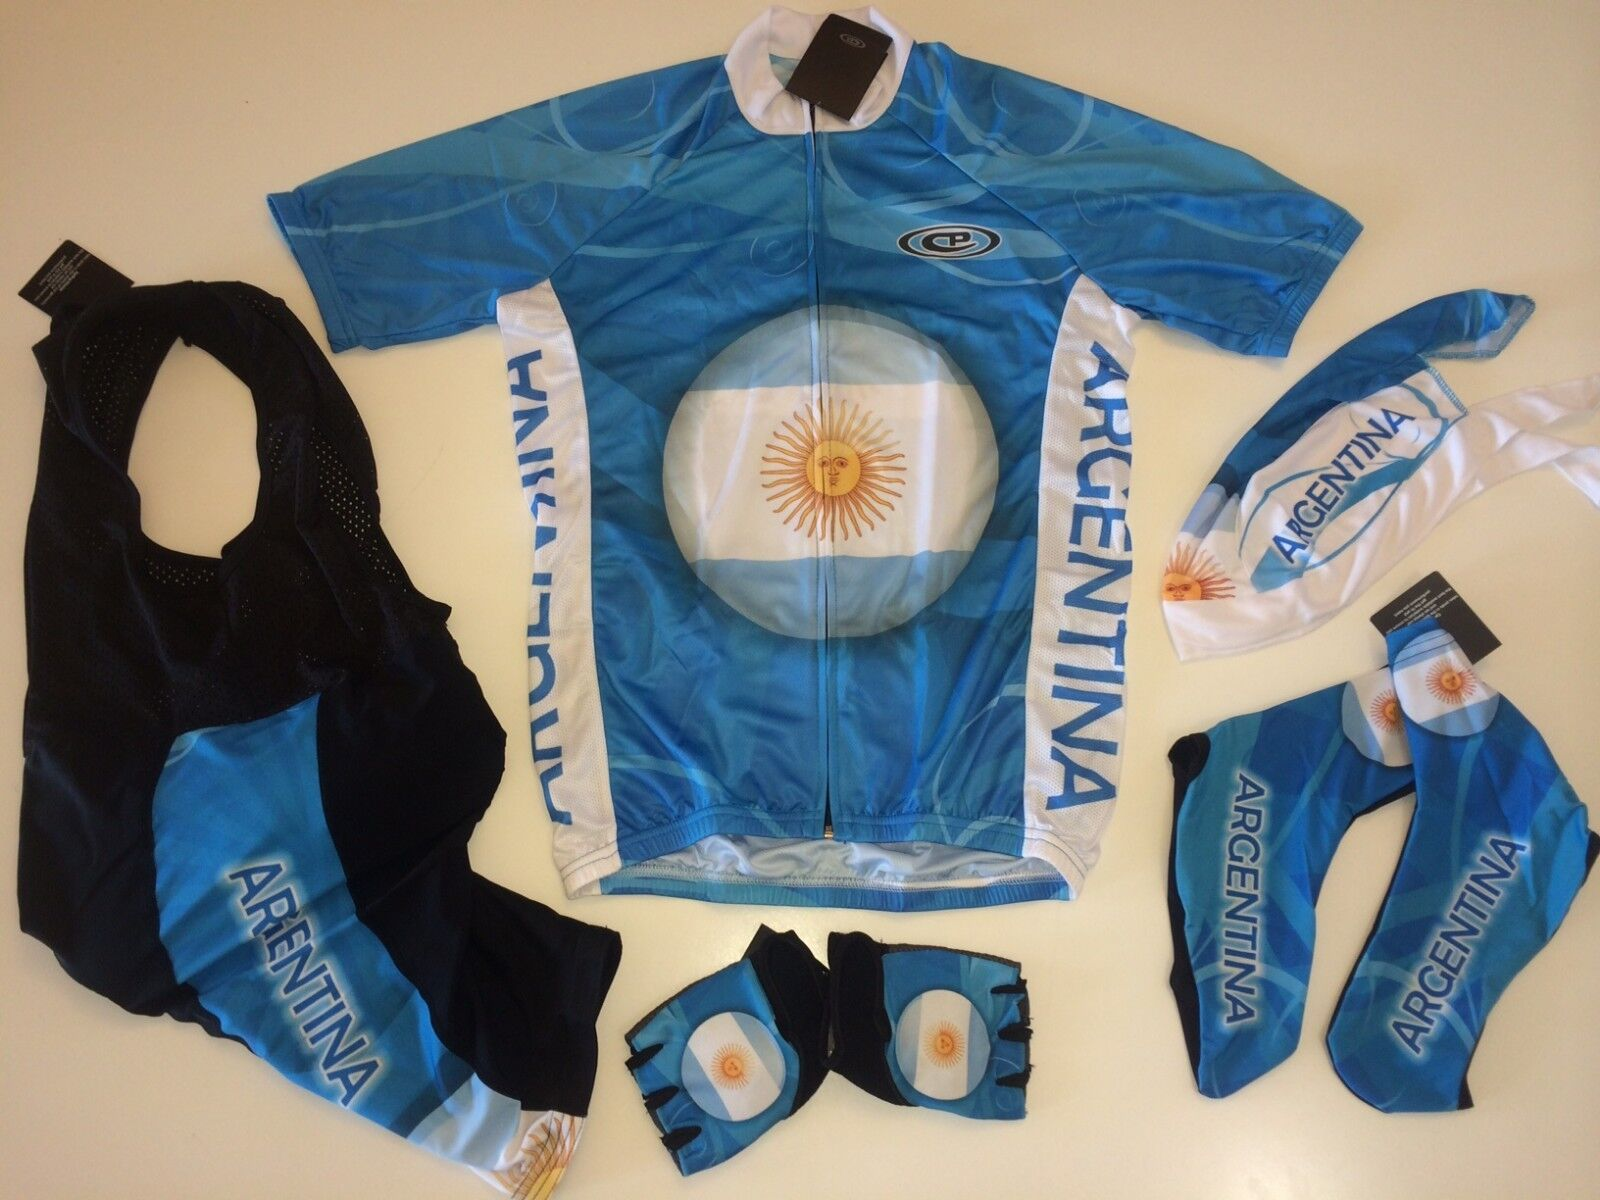 New Größe M - ARGENTINA Team Cycling Flag Road Bike Set Jersey Bib Shorts Gloves